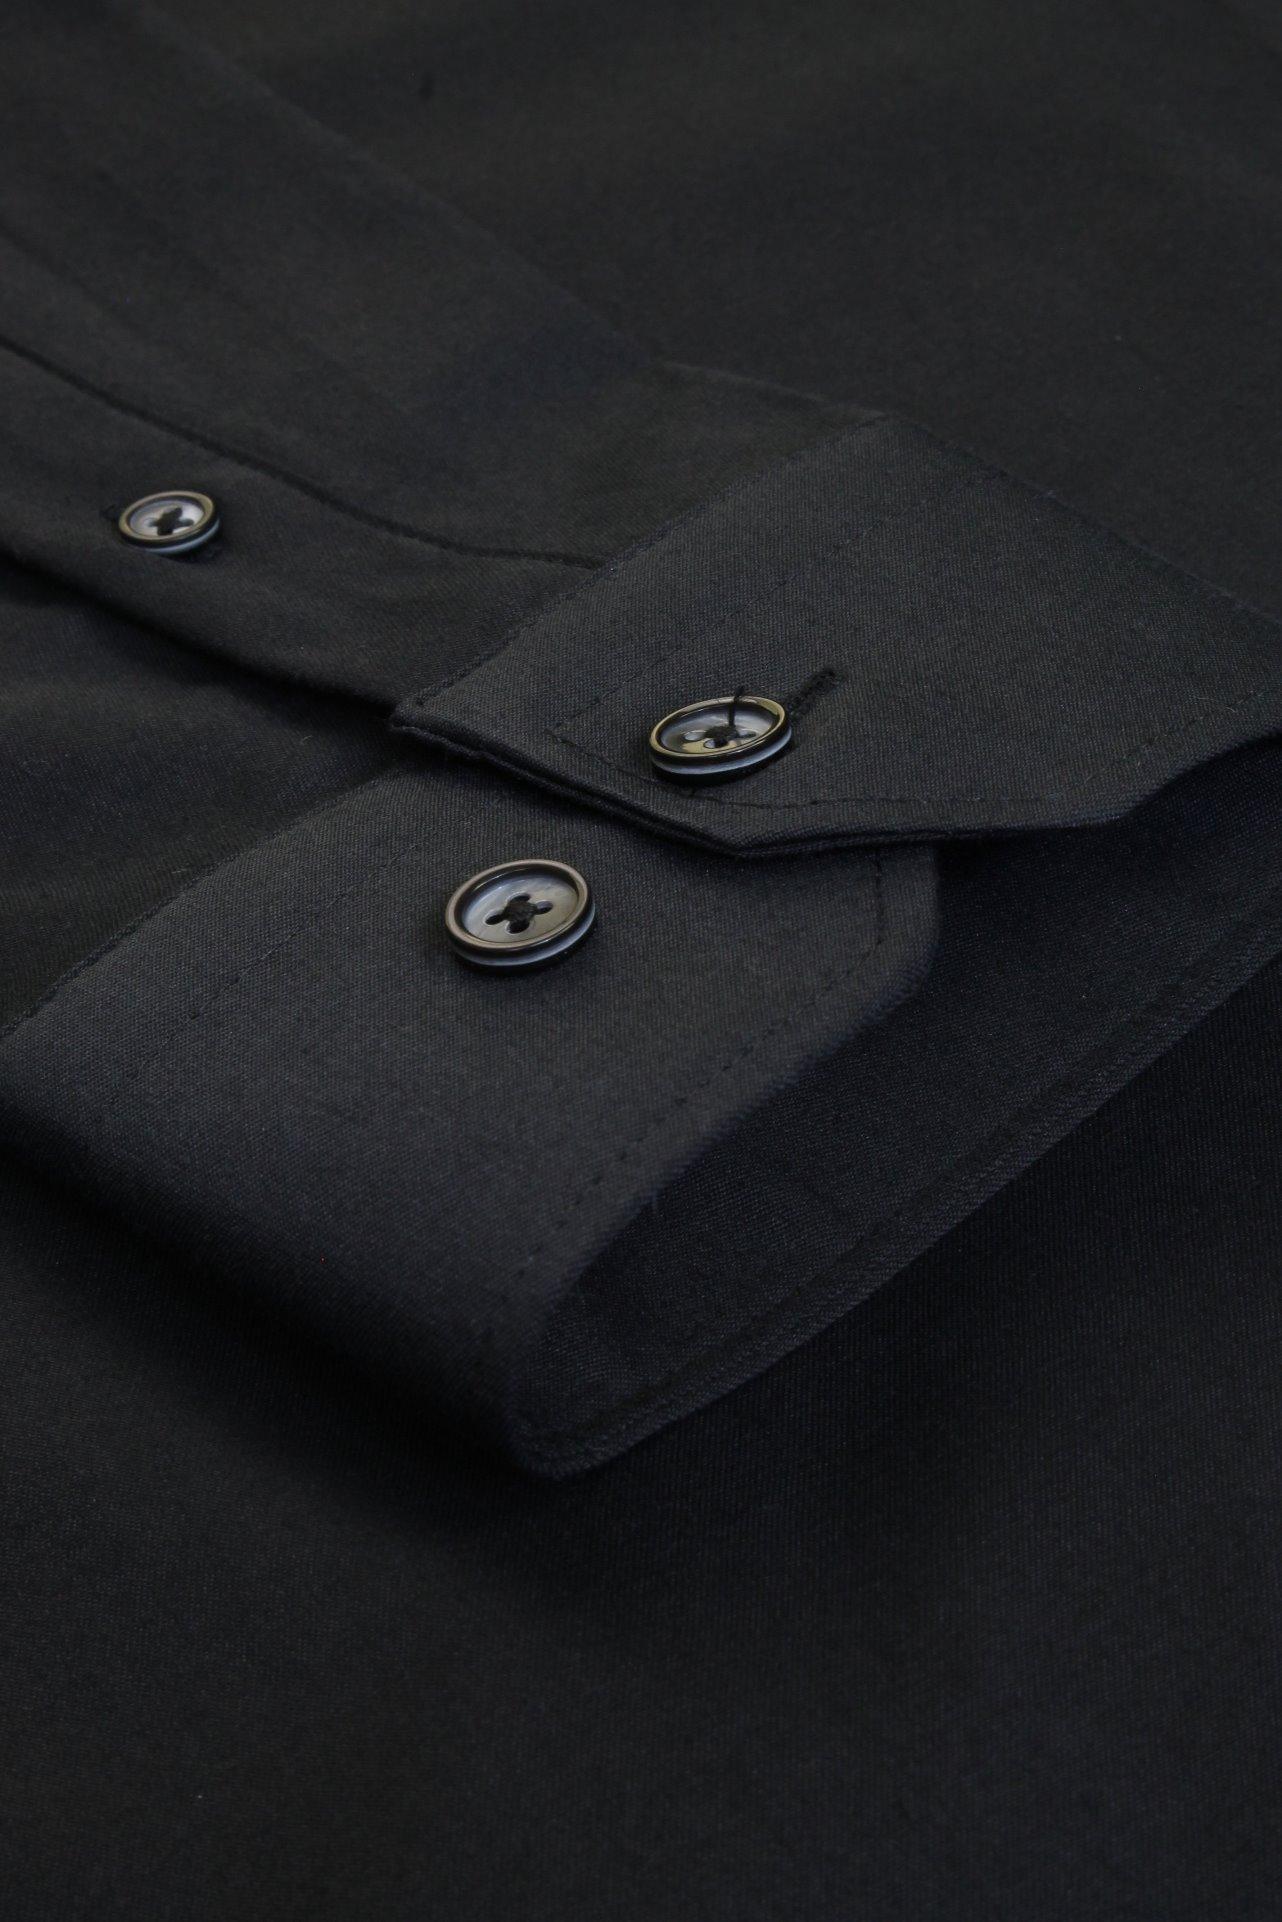 Xact-Mens-Long-Sleeved-Poplin-Stretch-Shirt-Slim-Fit miniatuur 8